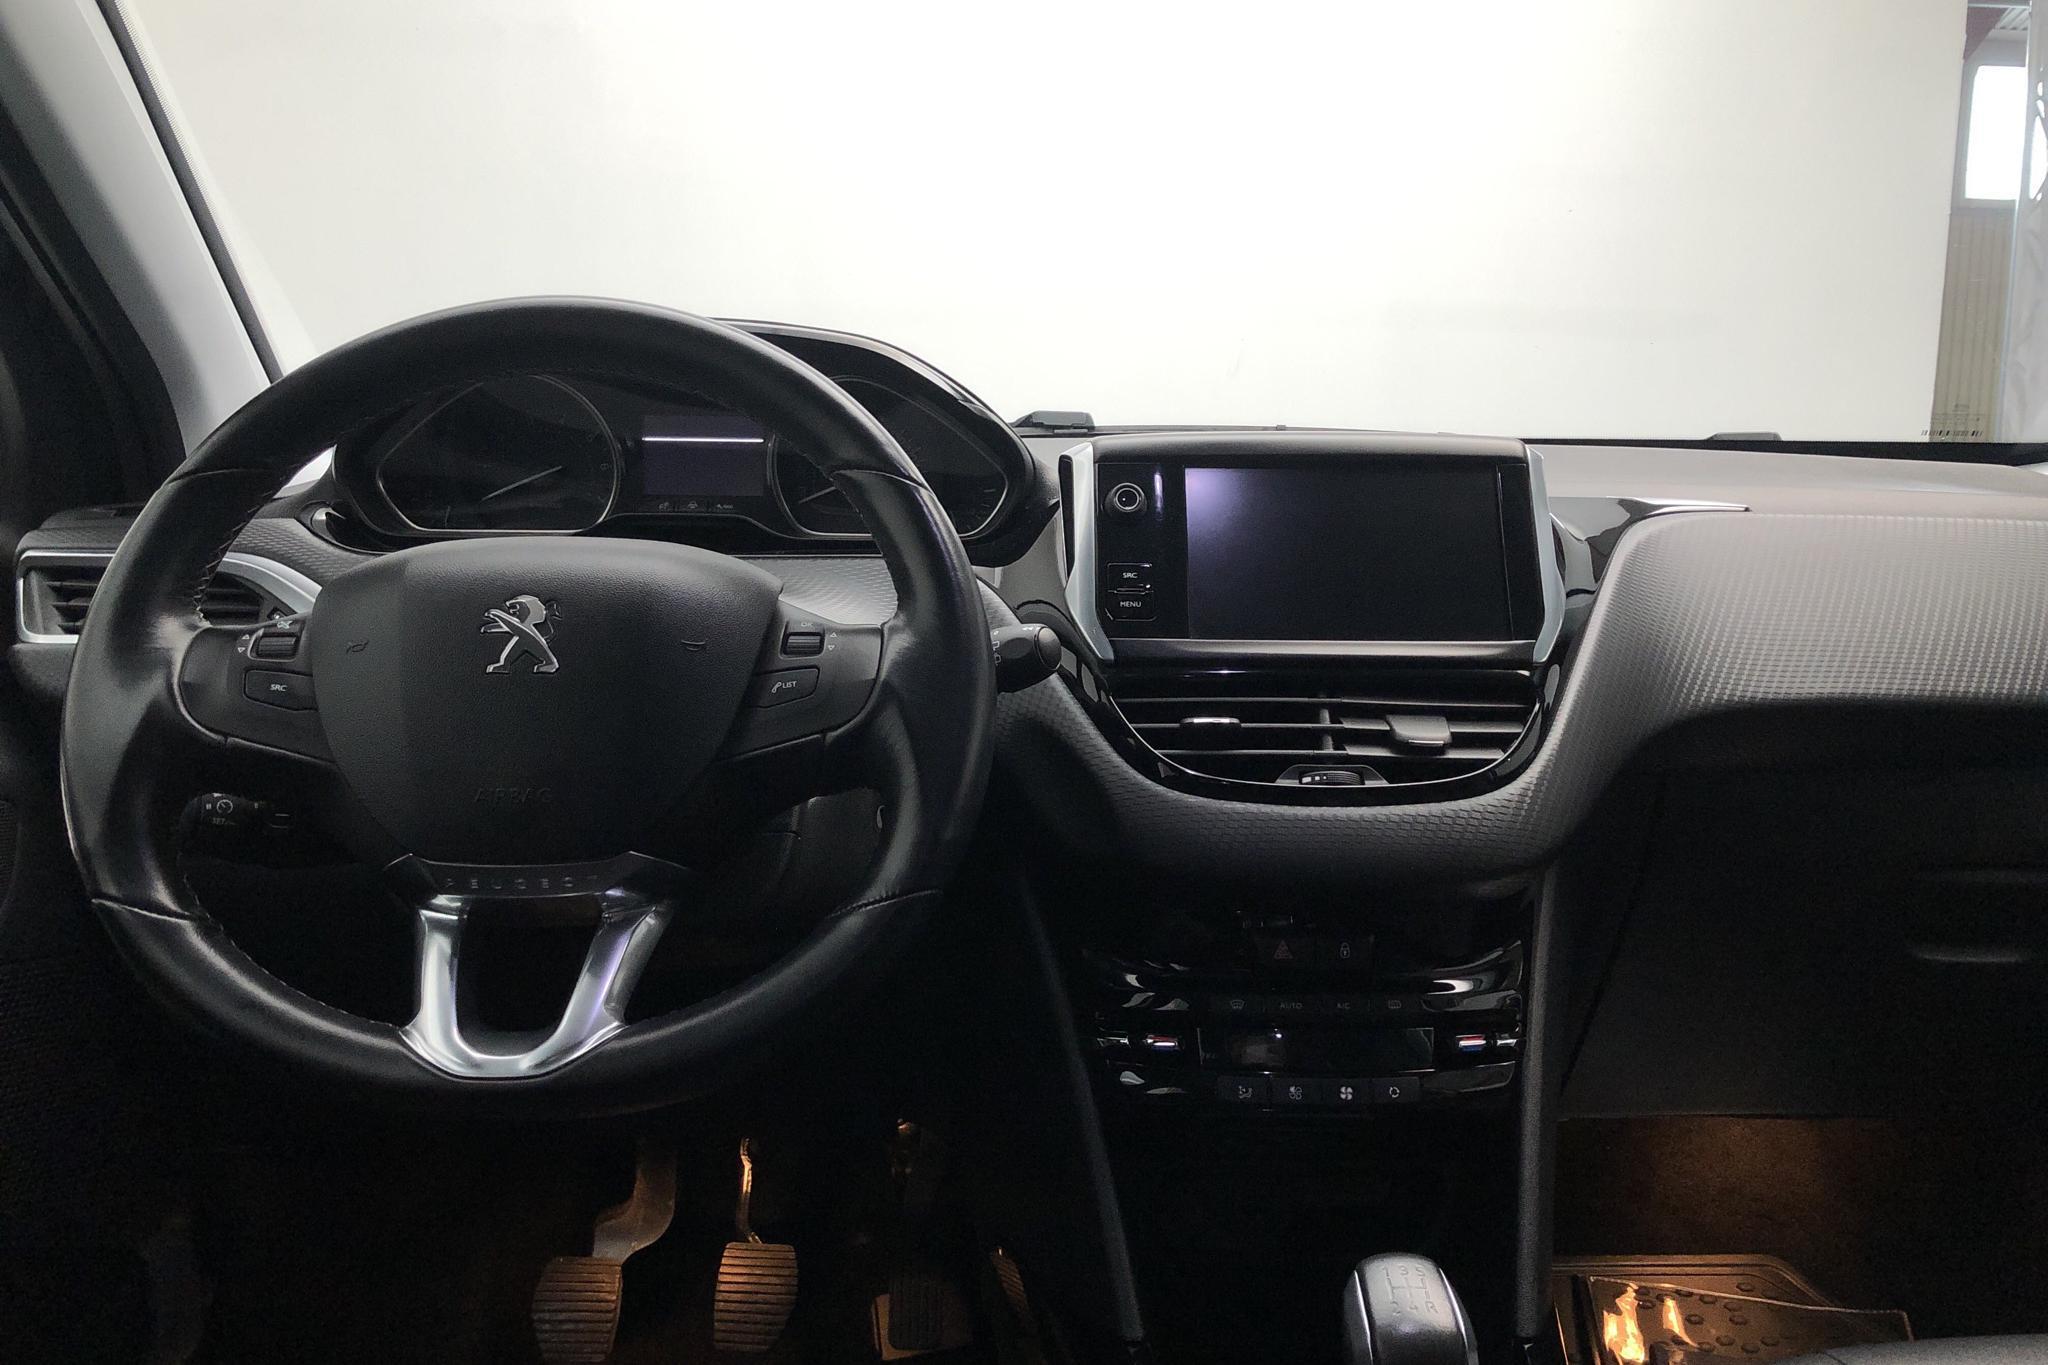 Peugeot 2008 1.2 PureTech (110hk) - 43 020 km - Manual - 2018